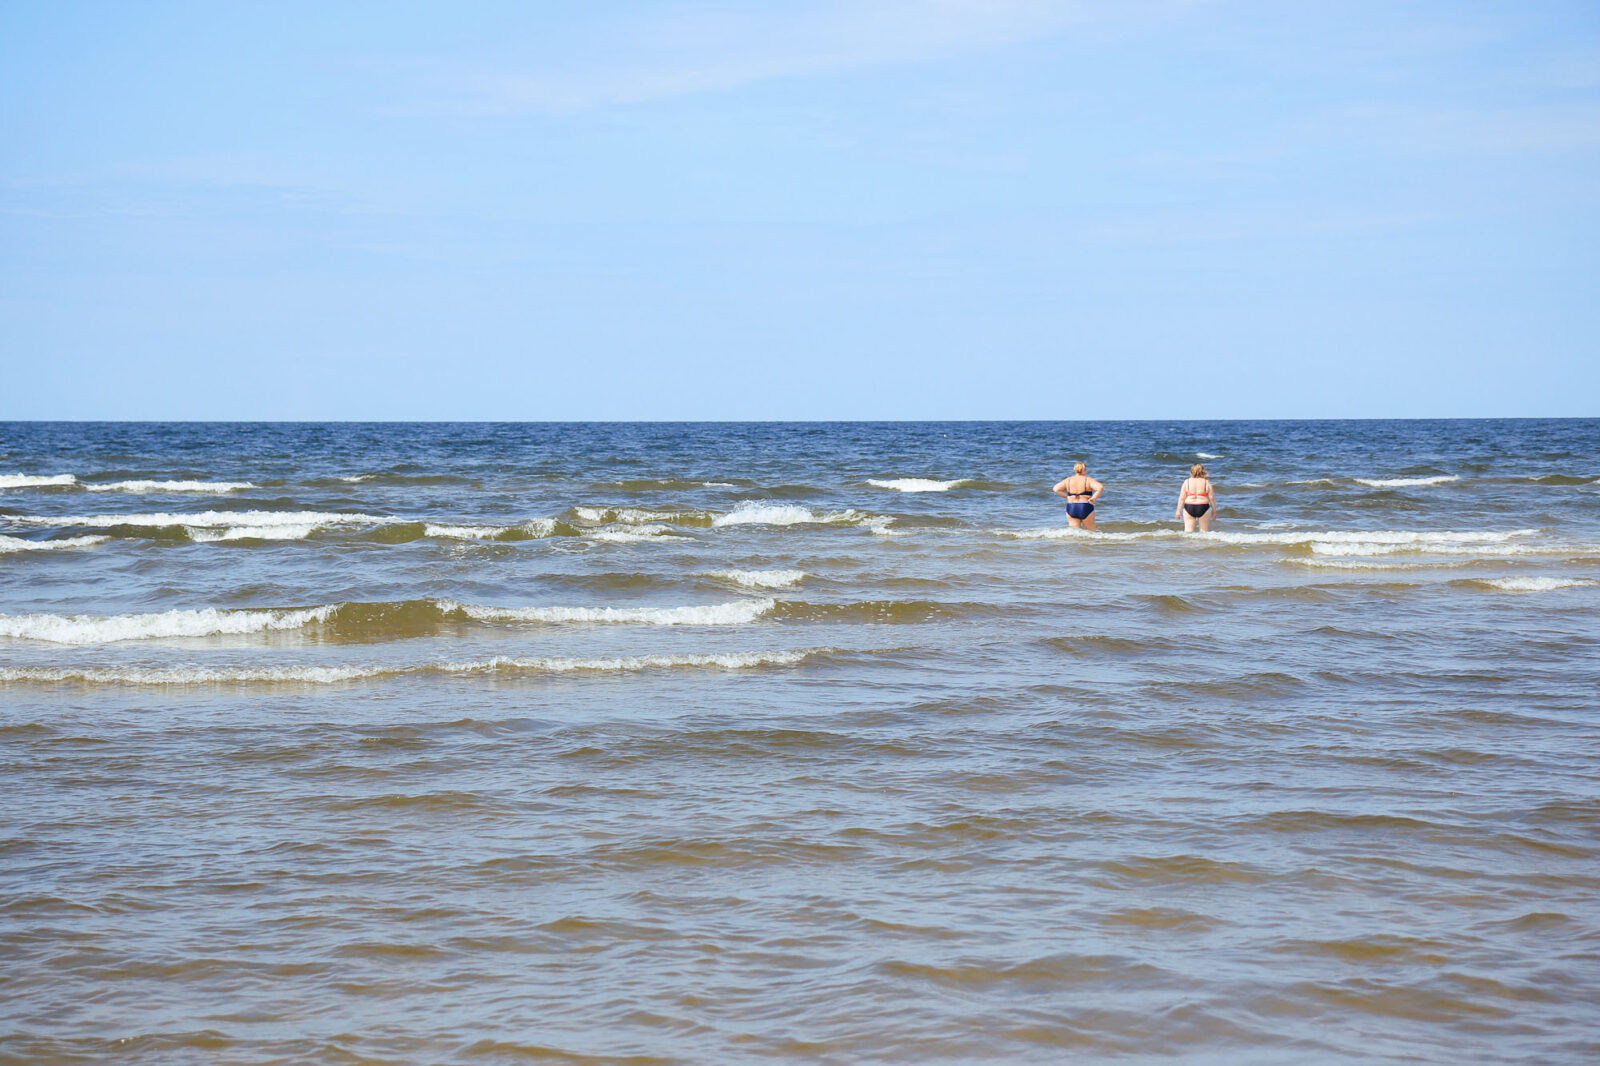 Riga Jurmala Strand Städtereise